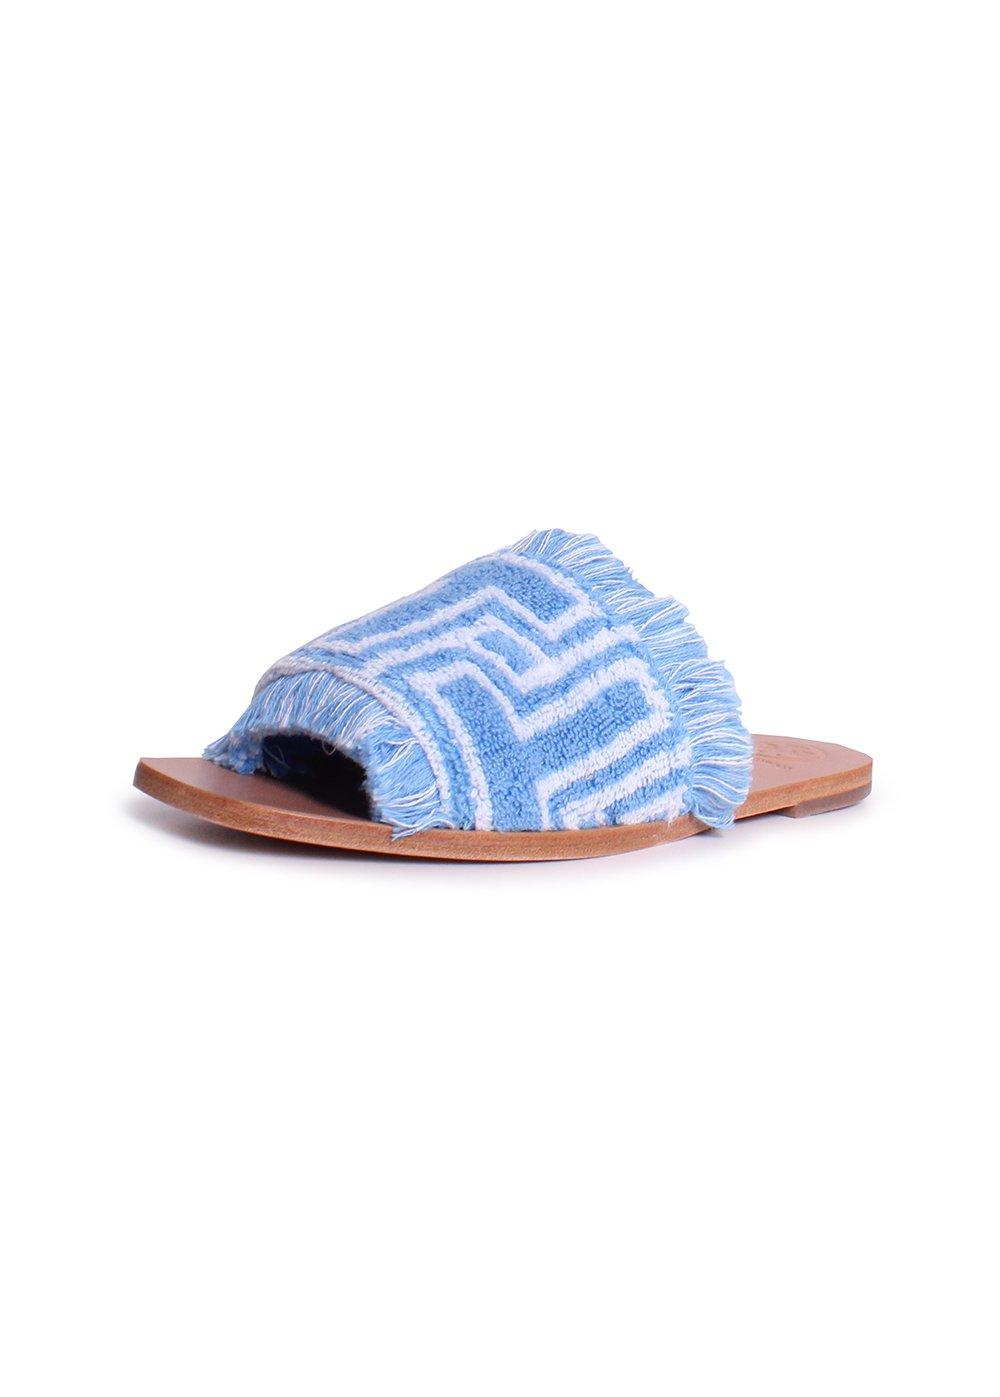 Tory Burch T-Tile Flat Slide Sandals in Blue Bird Ivory Size 5